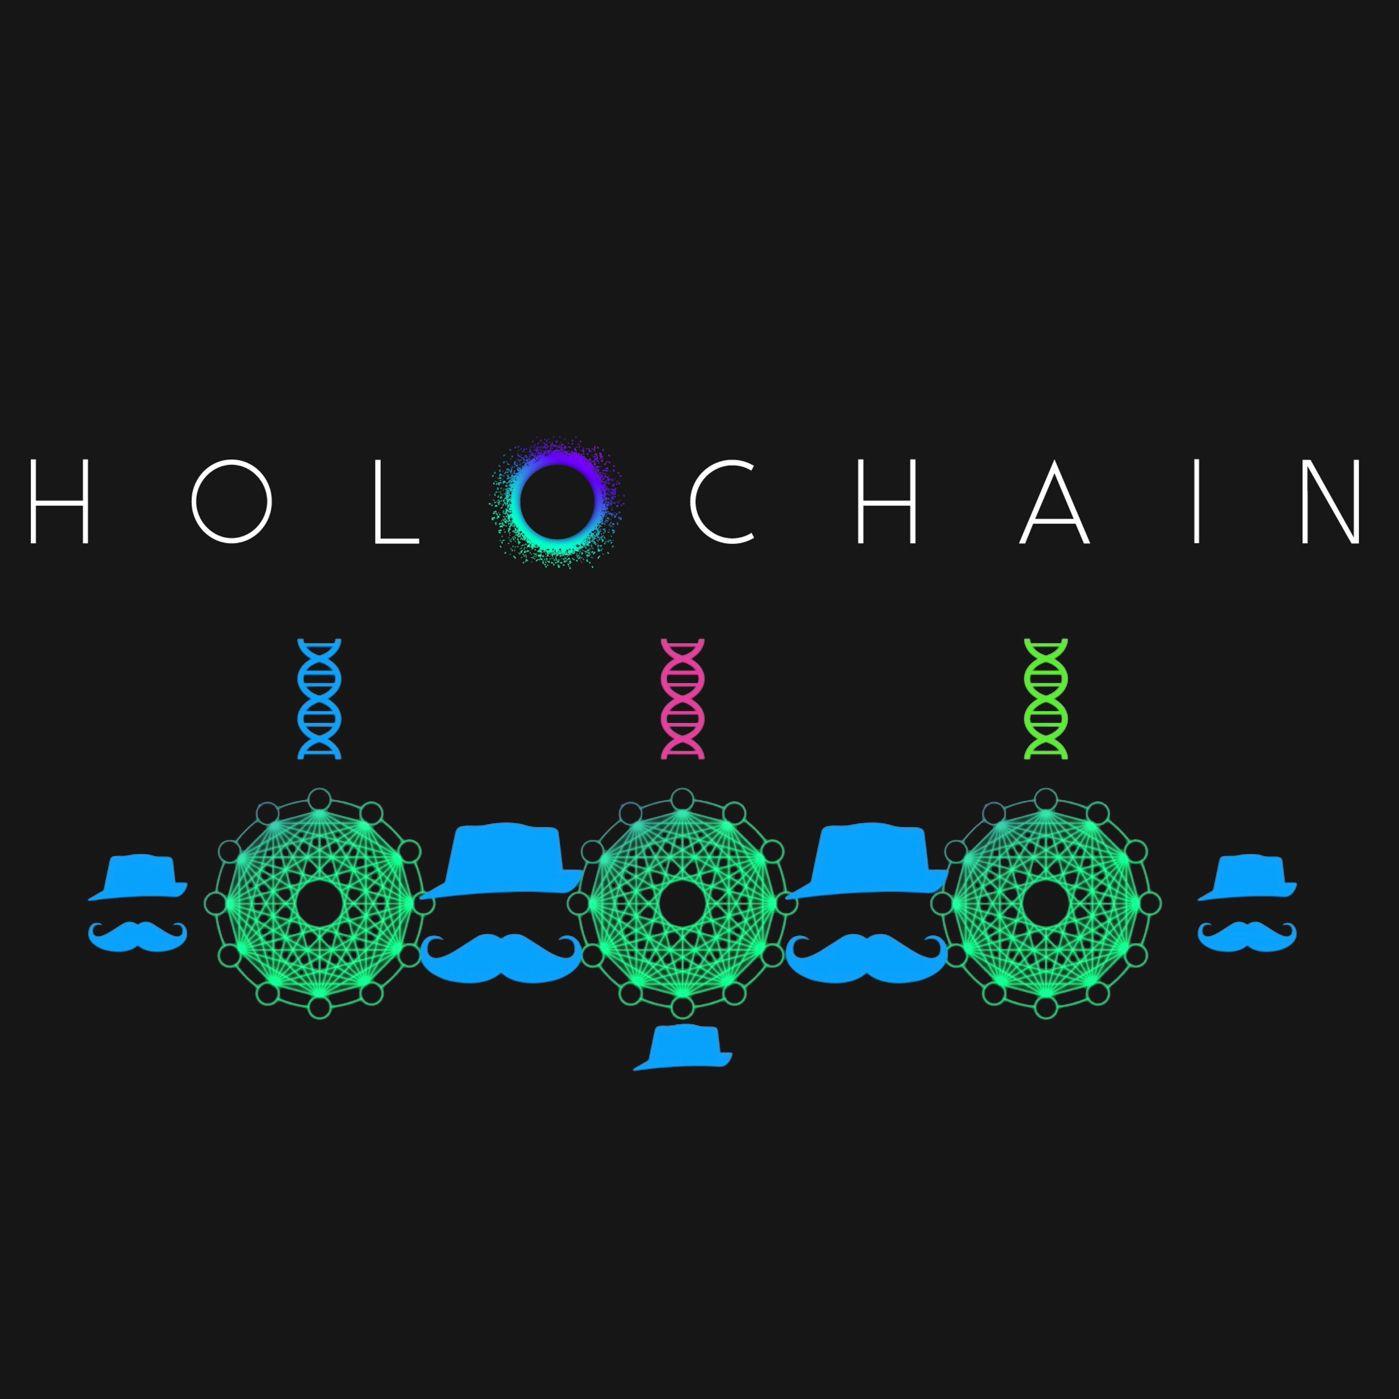 Ceptr the third web #17 - arthur brock, holochain - the third web